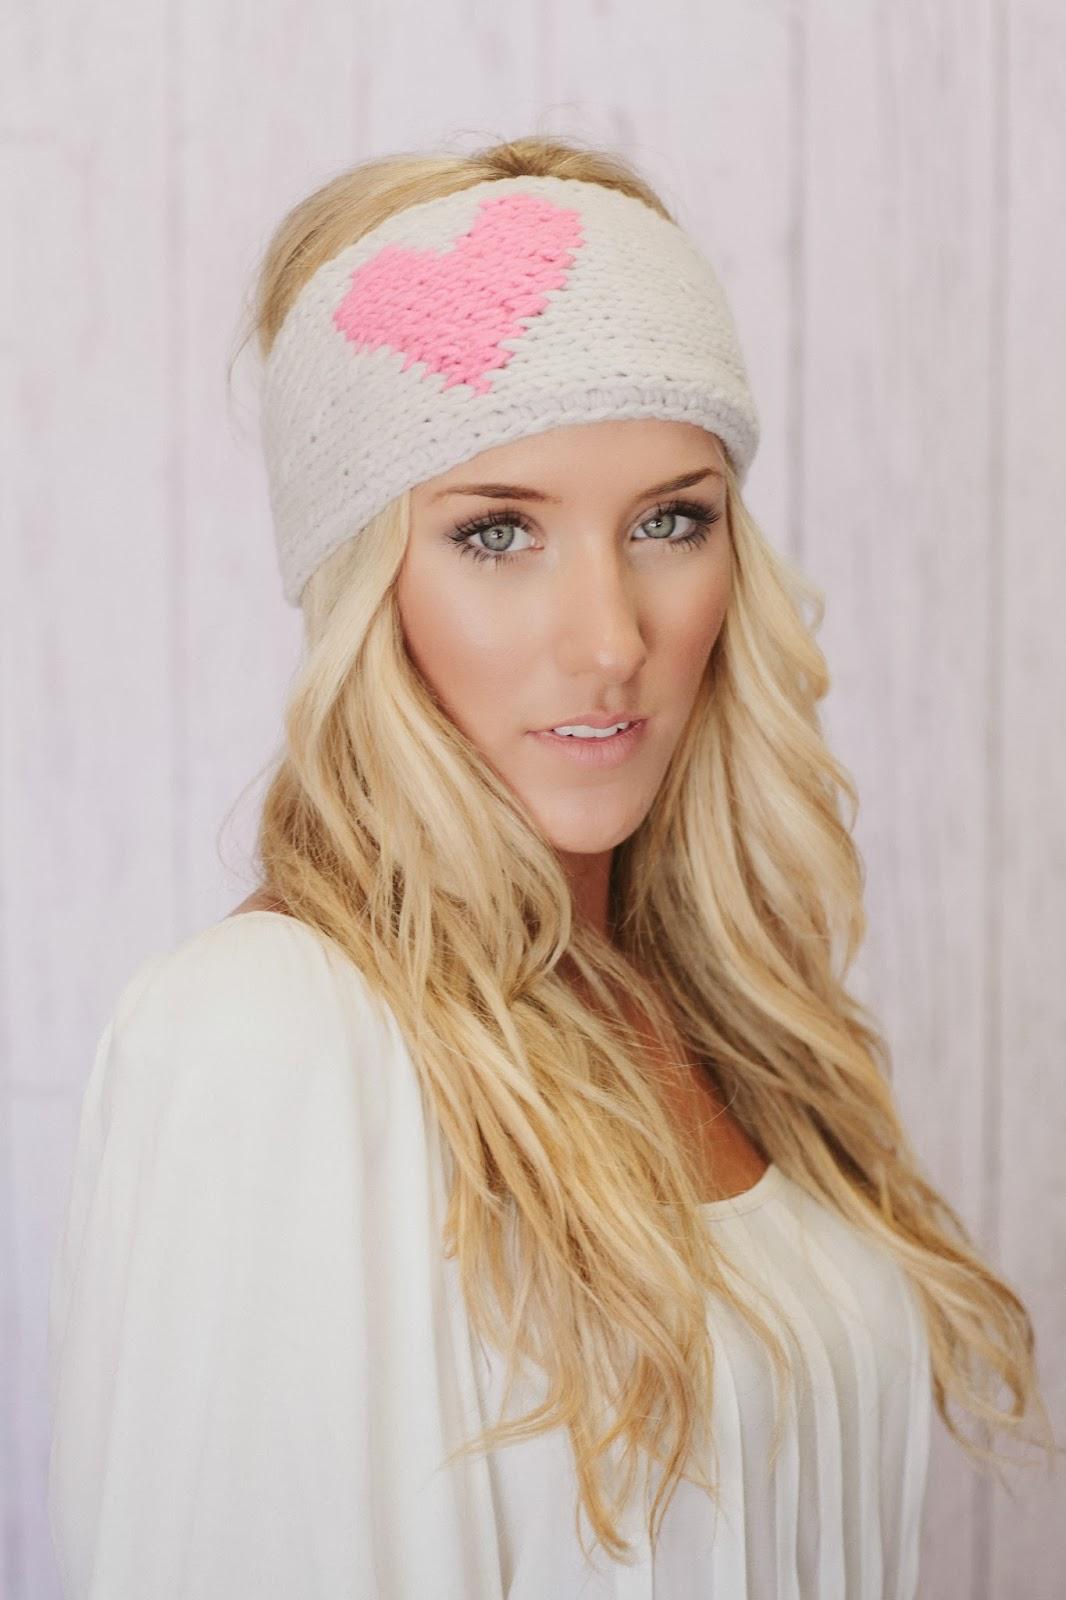 Фото вязание спицами повязки на голову для женщин